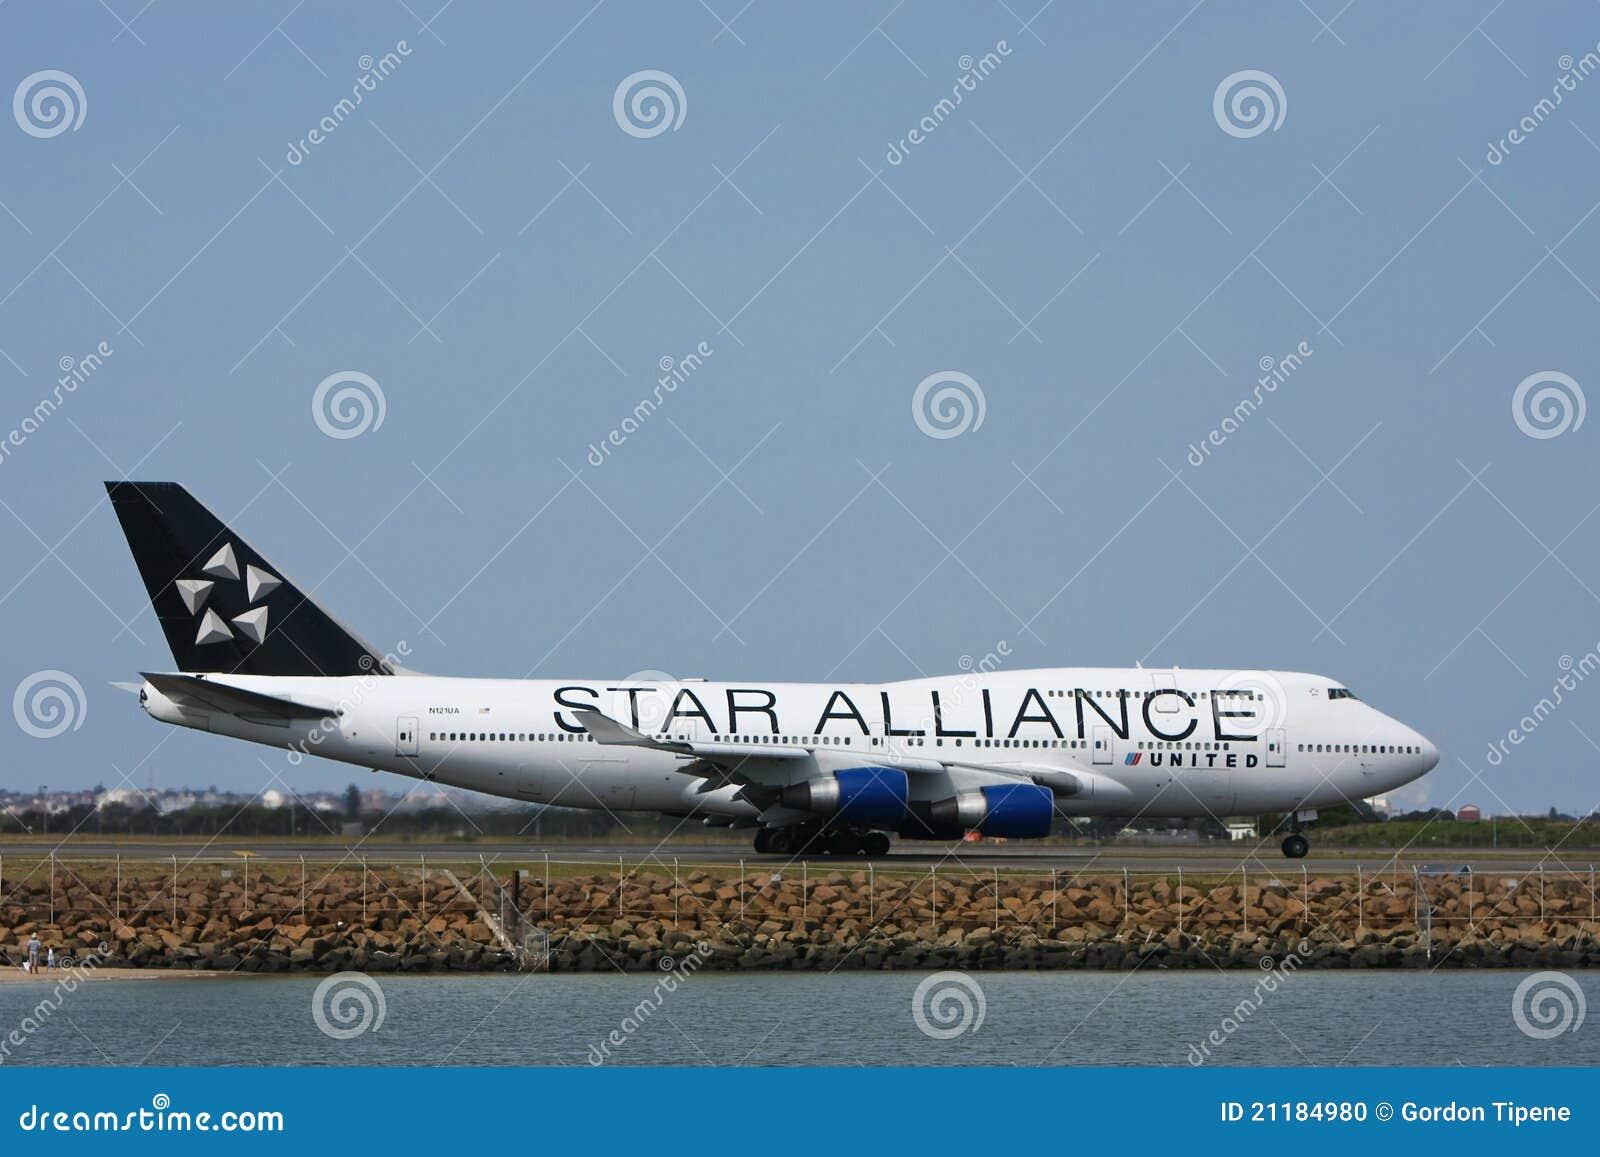 Star Alliance United Boeing 747 on runway.